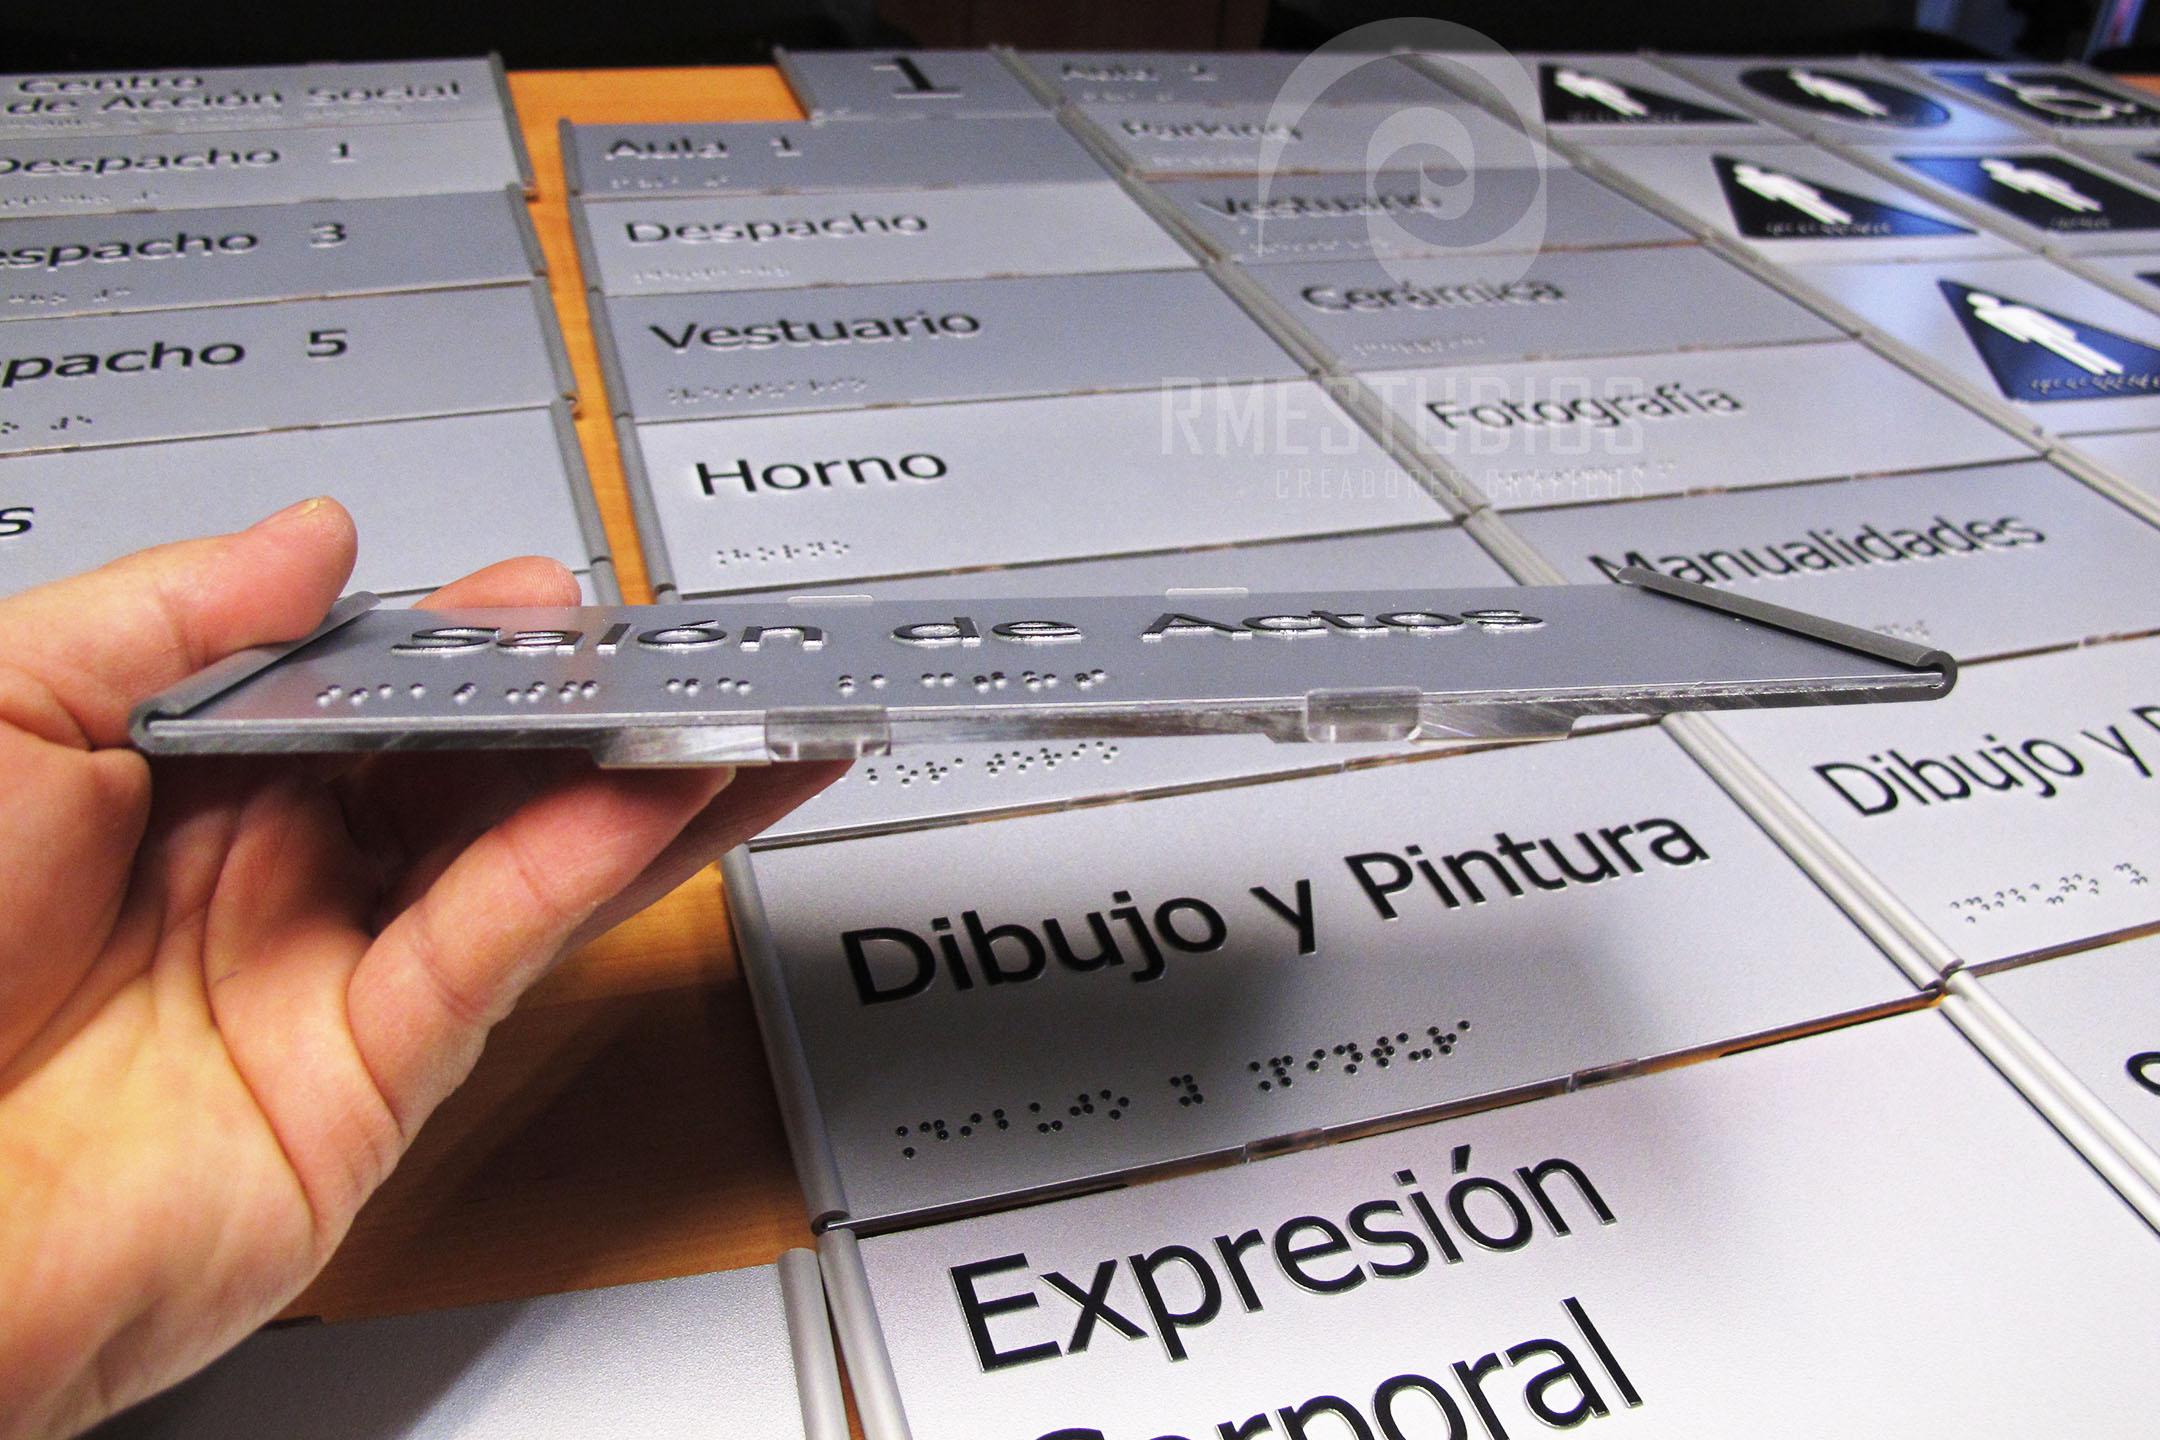 24-senaletica-accesible-senalizacion-en-Braille